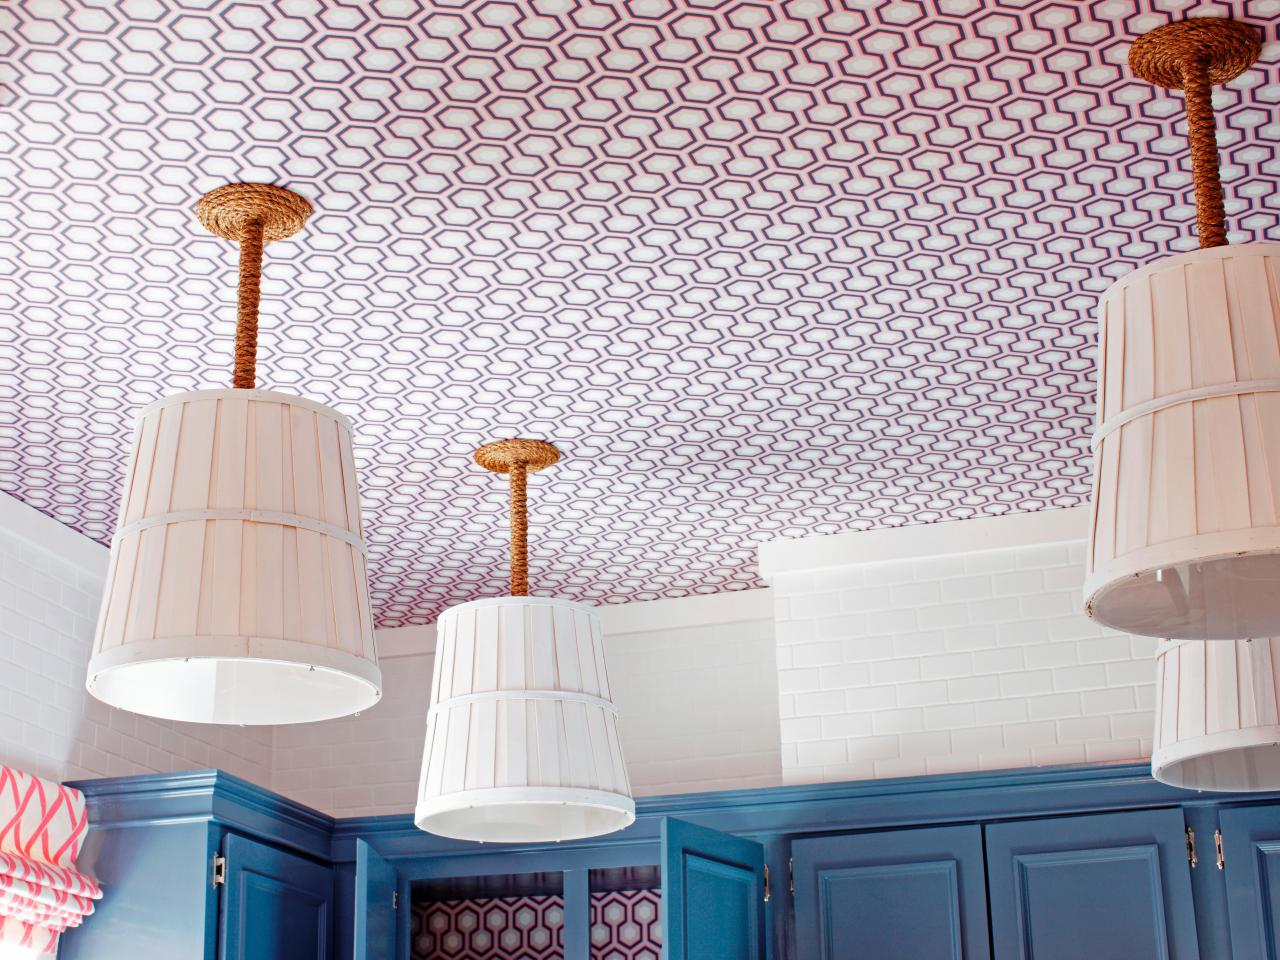 Rope ceiling light